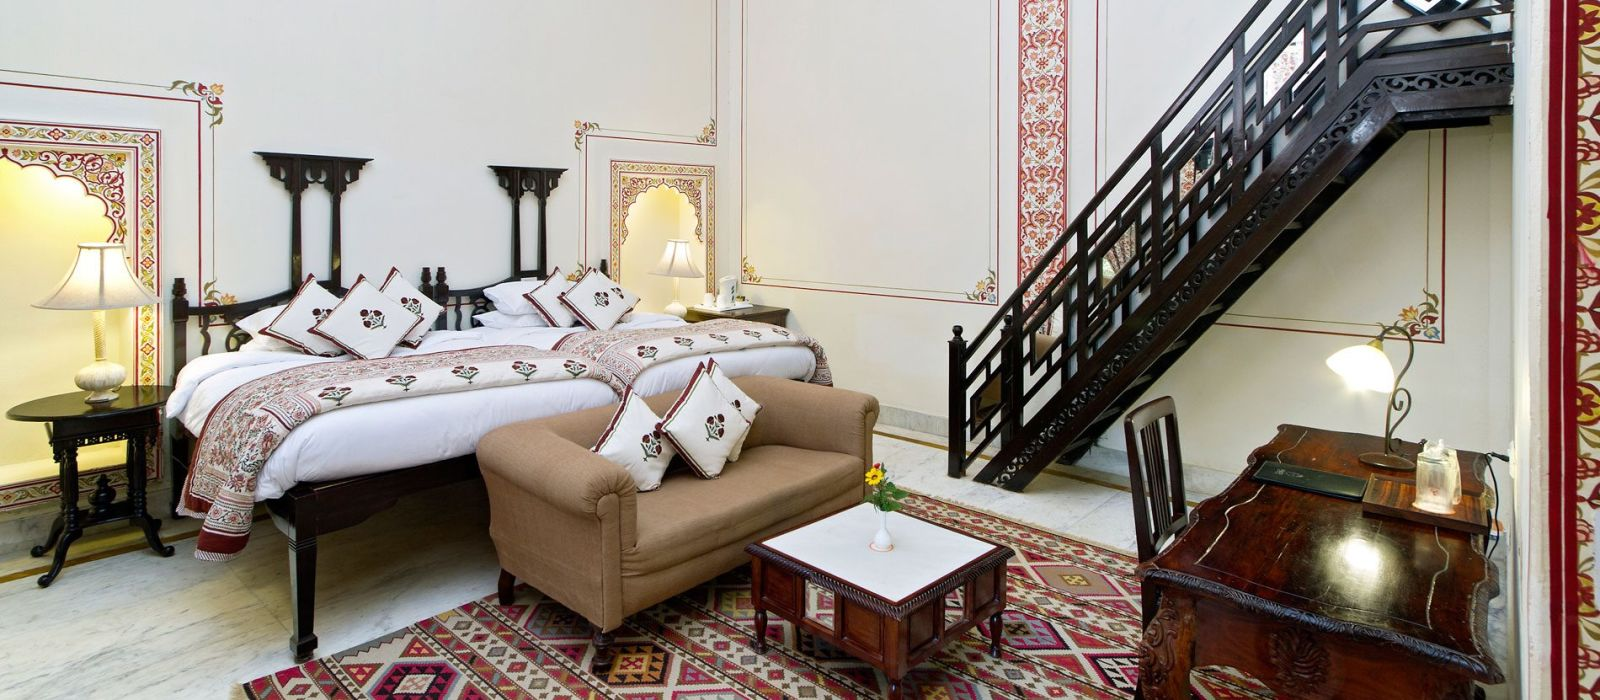 Hotel Rohetgarh Fort  Nordindien